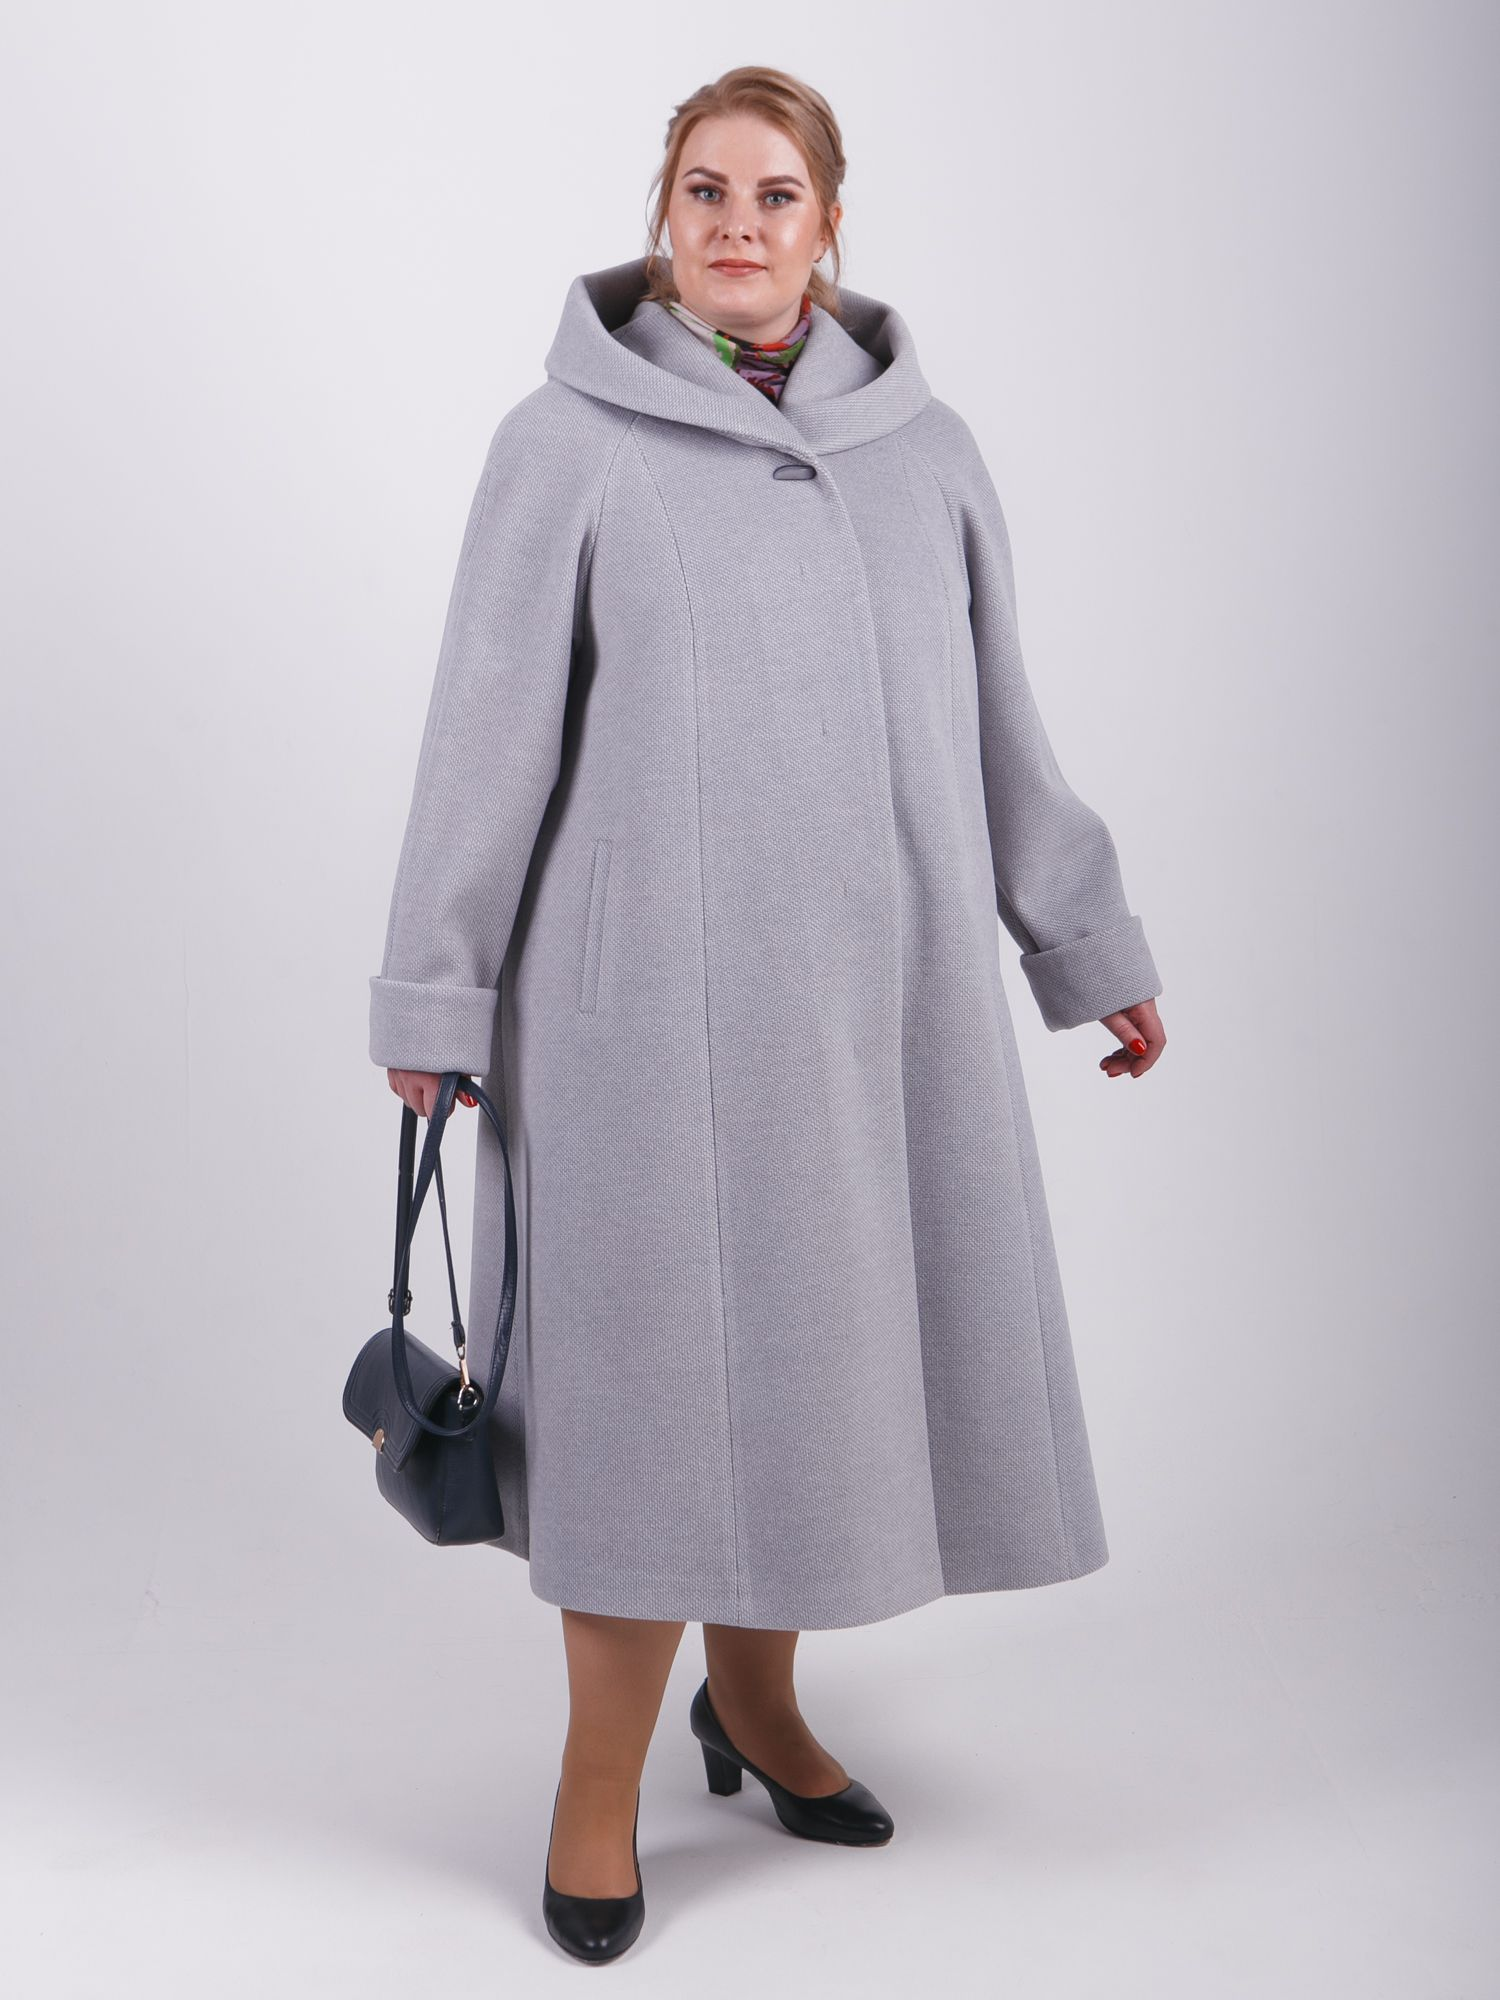 пальто женское серый цвет